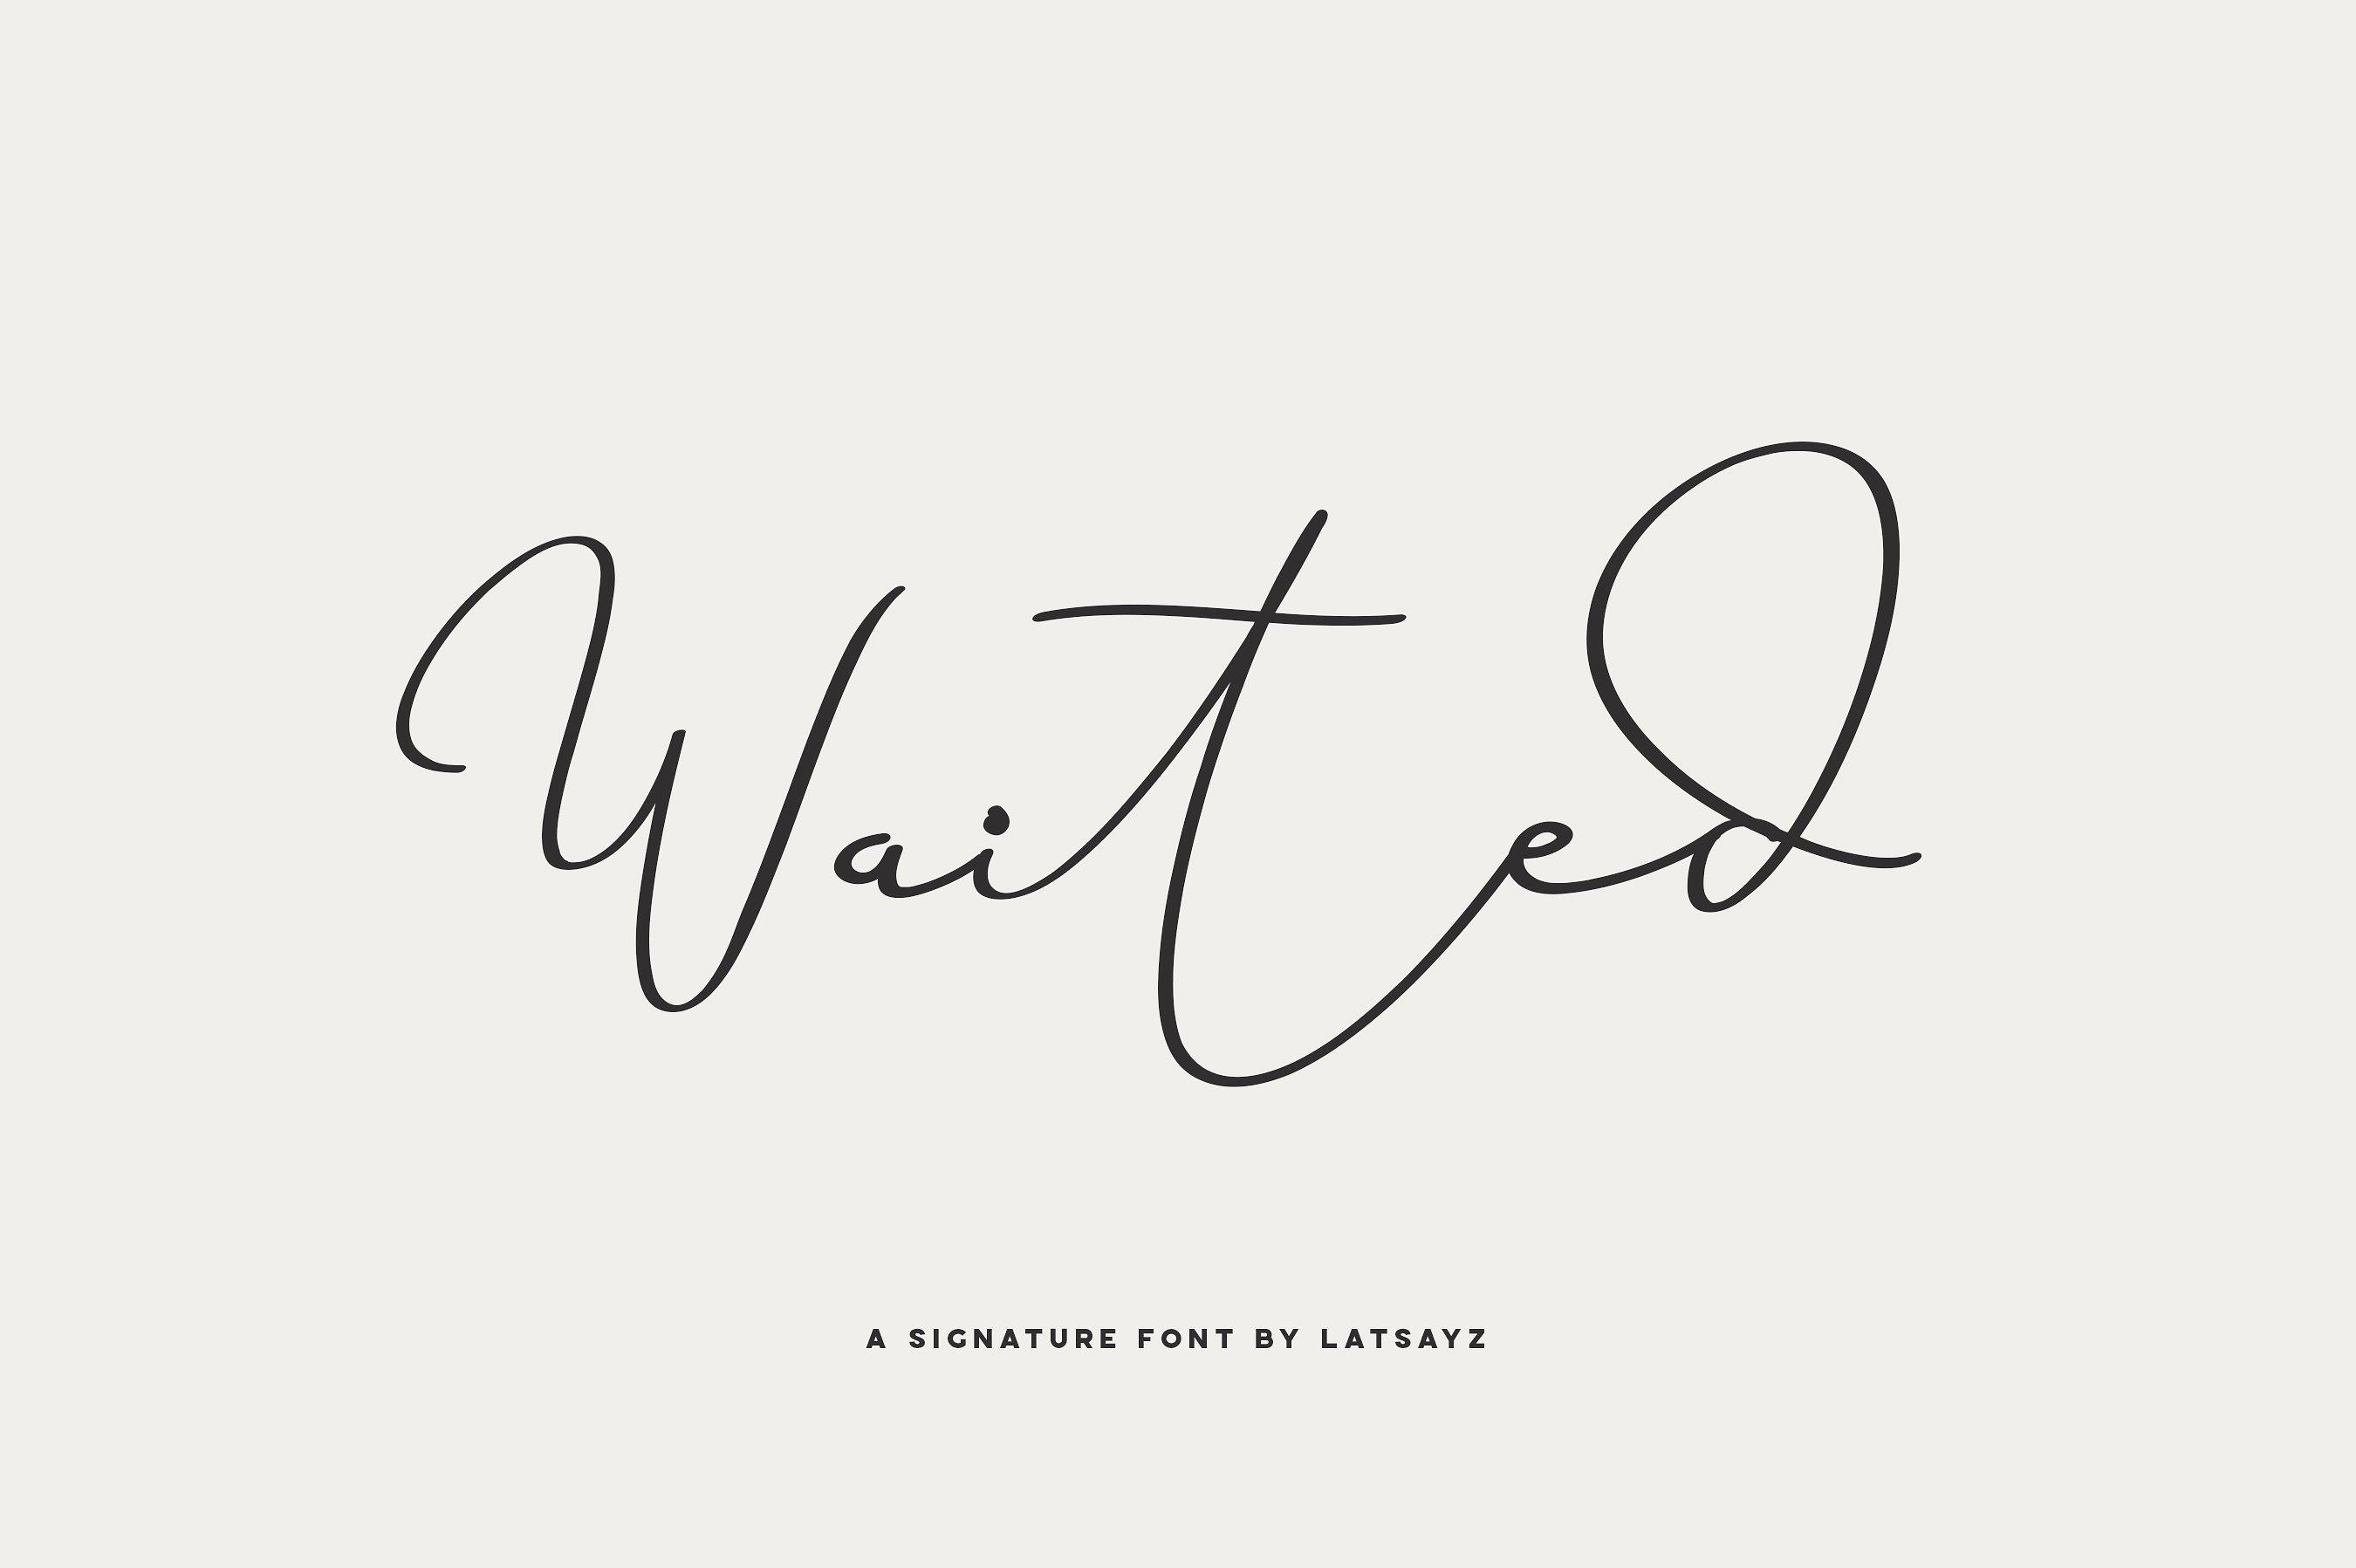 miss-waited-signature-font